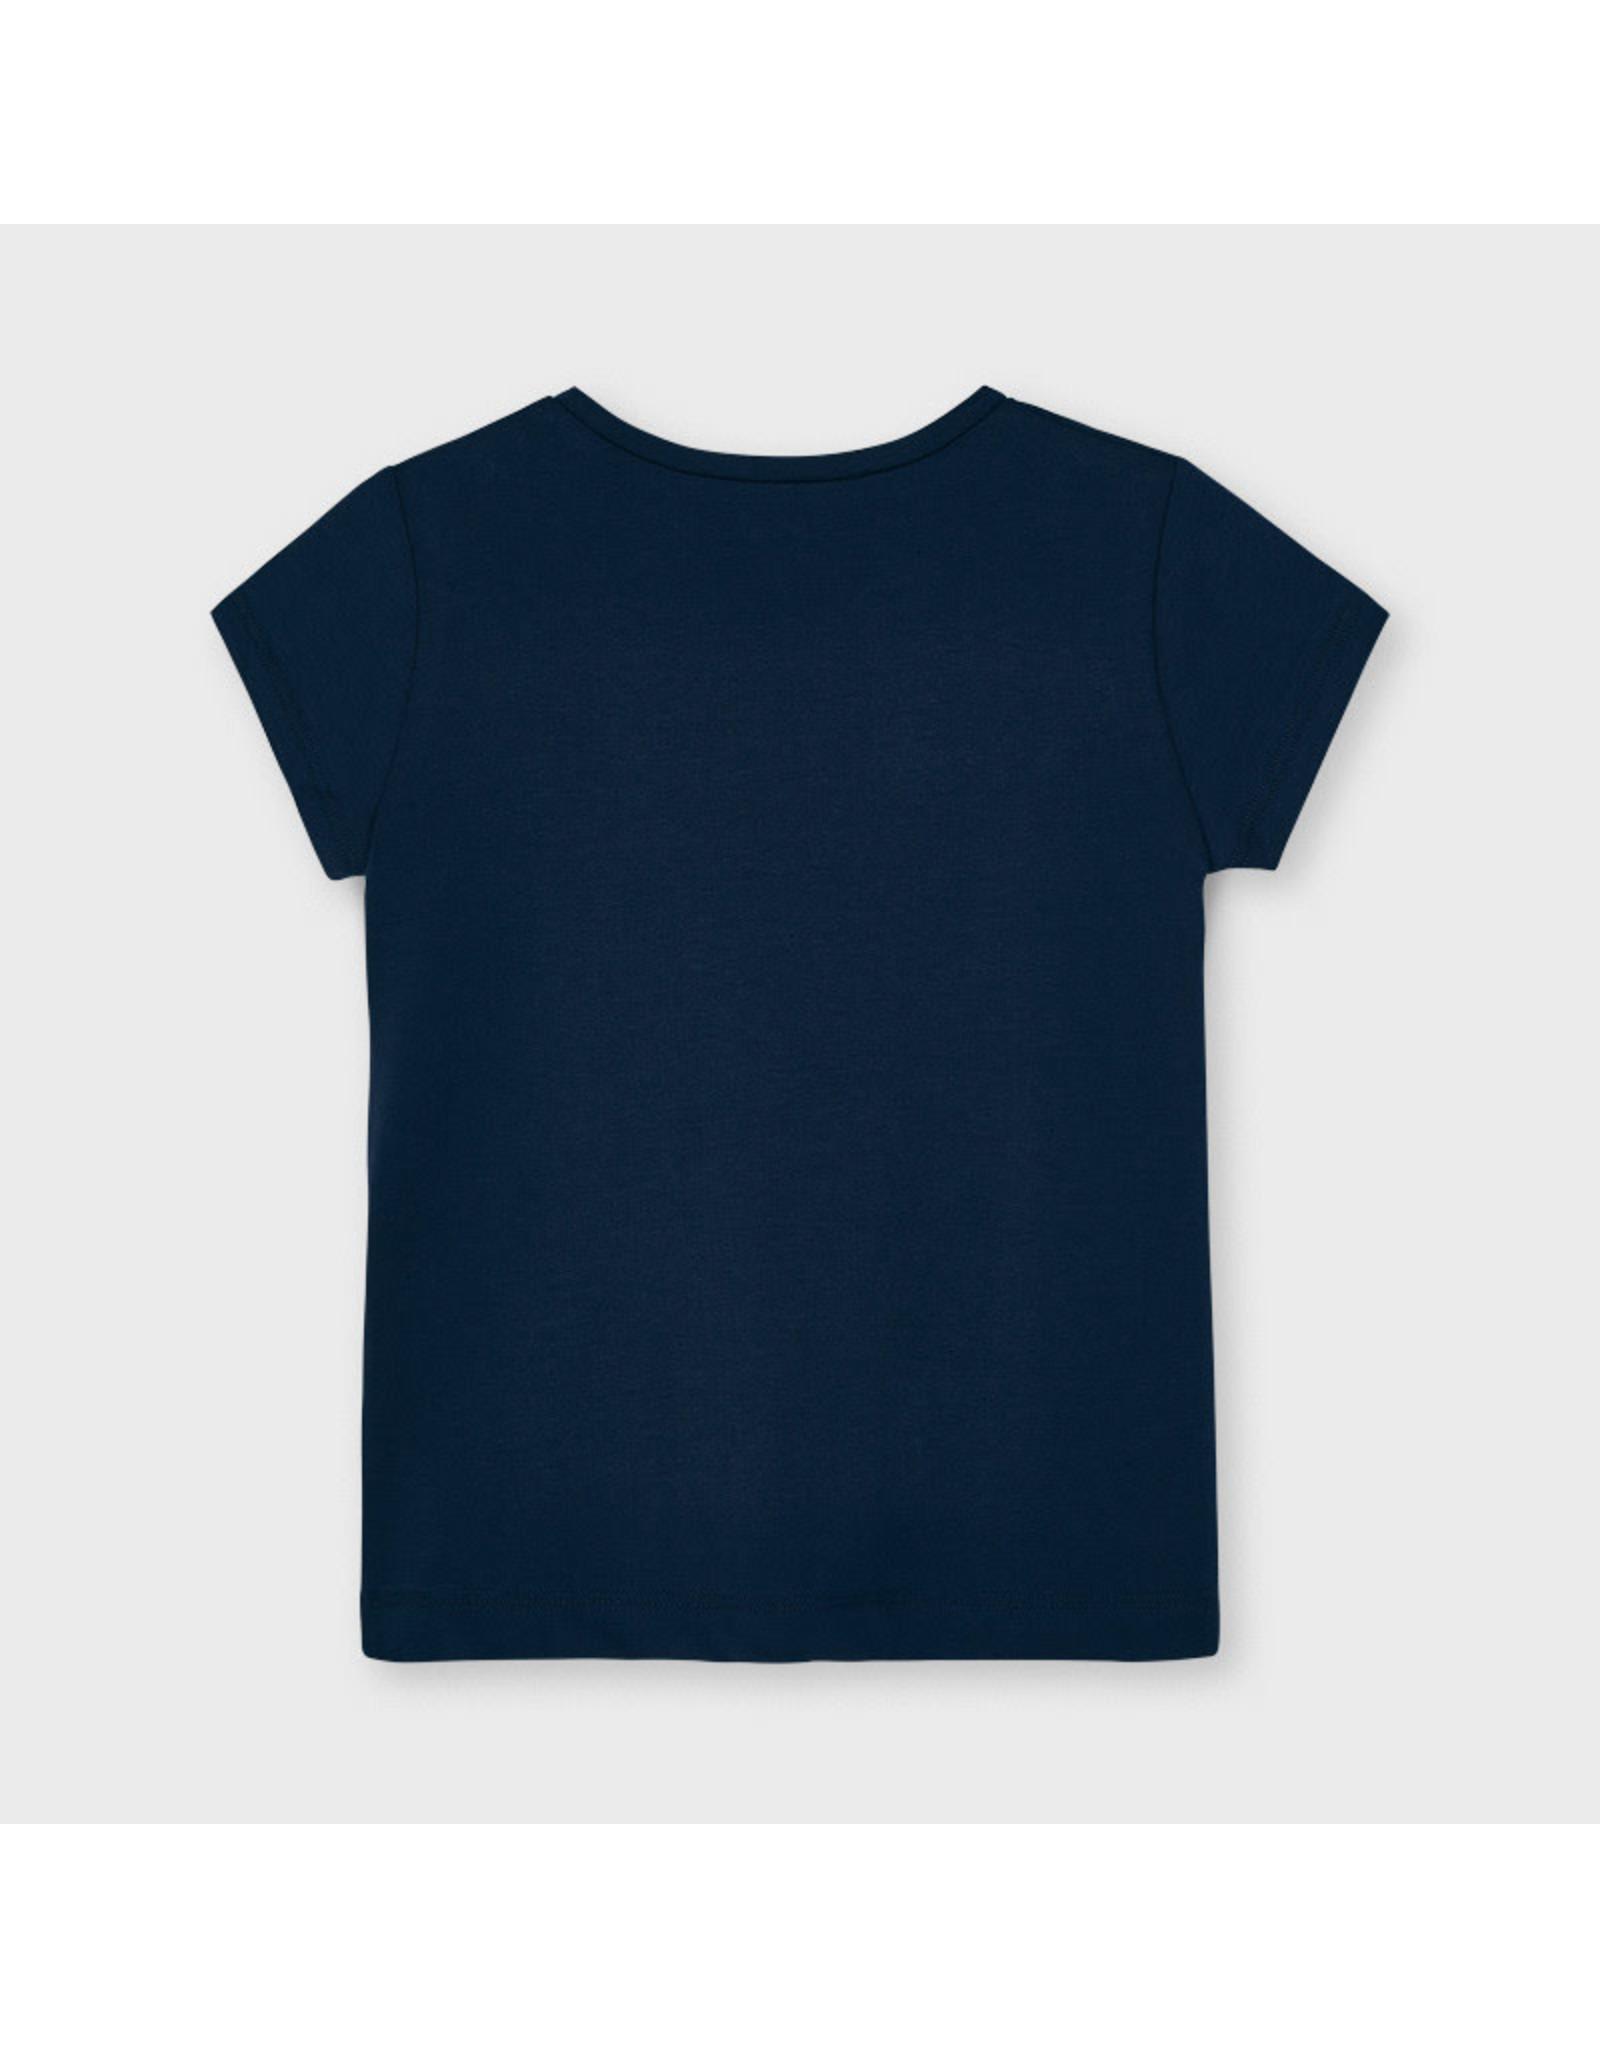 Mayoral Navy Bow T-Shirt